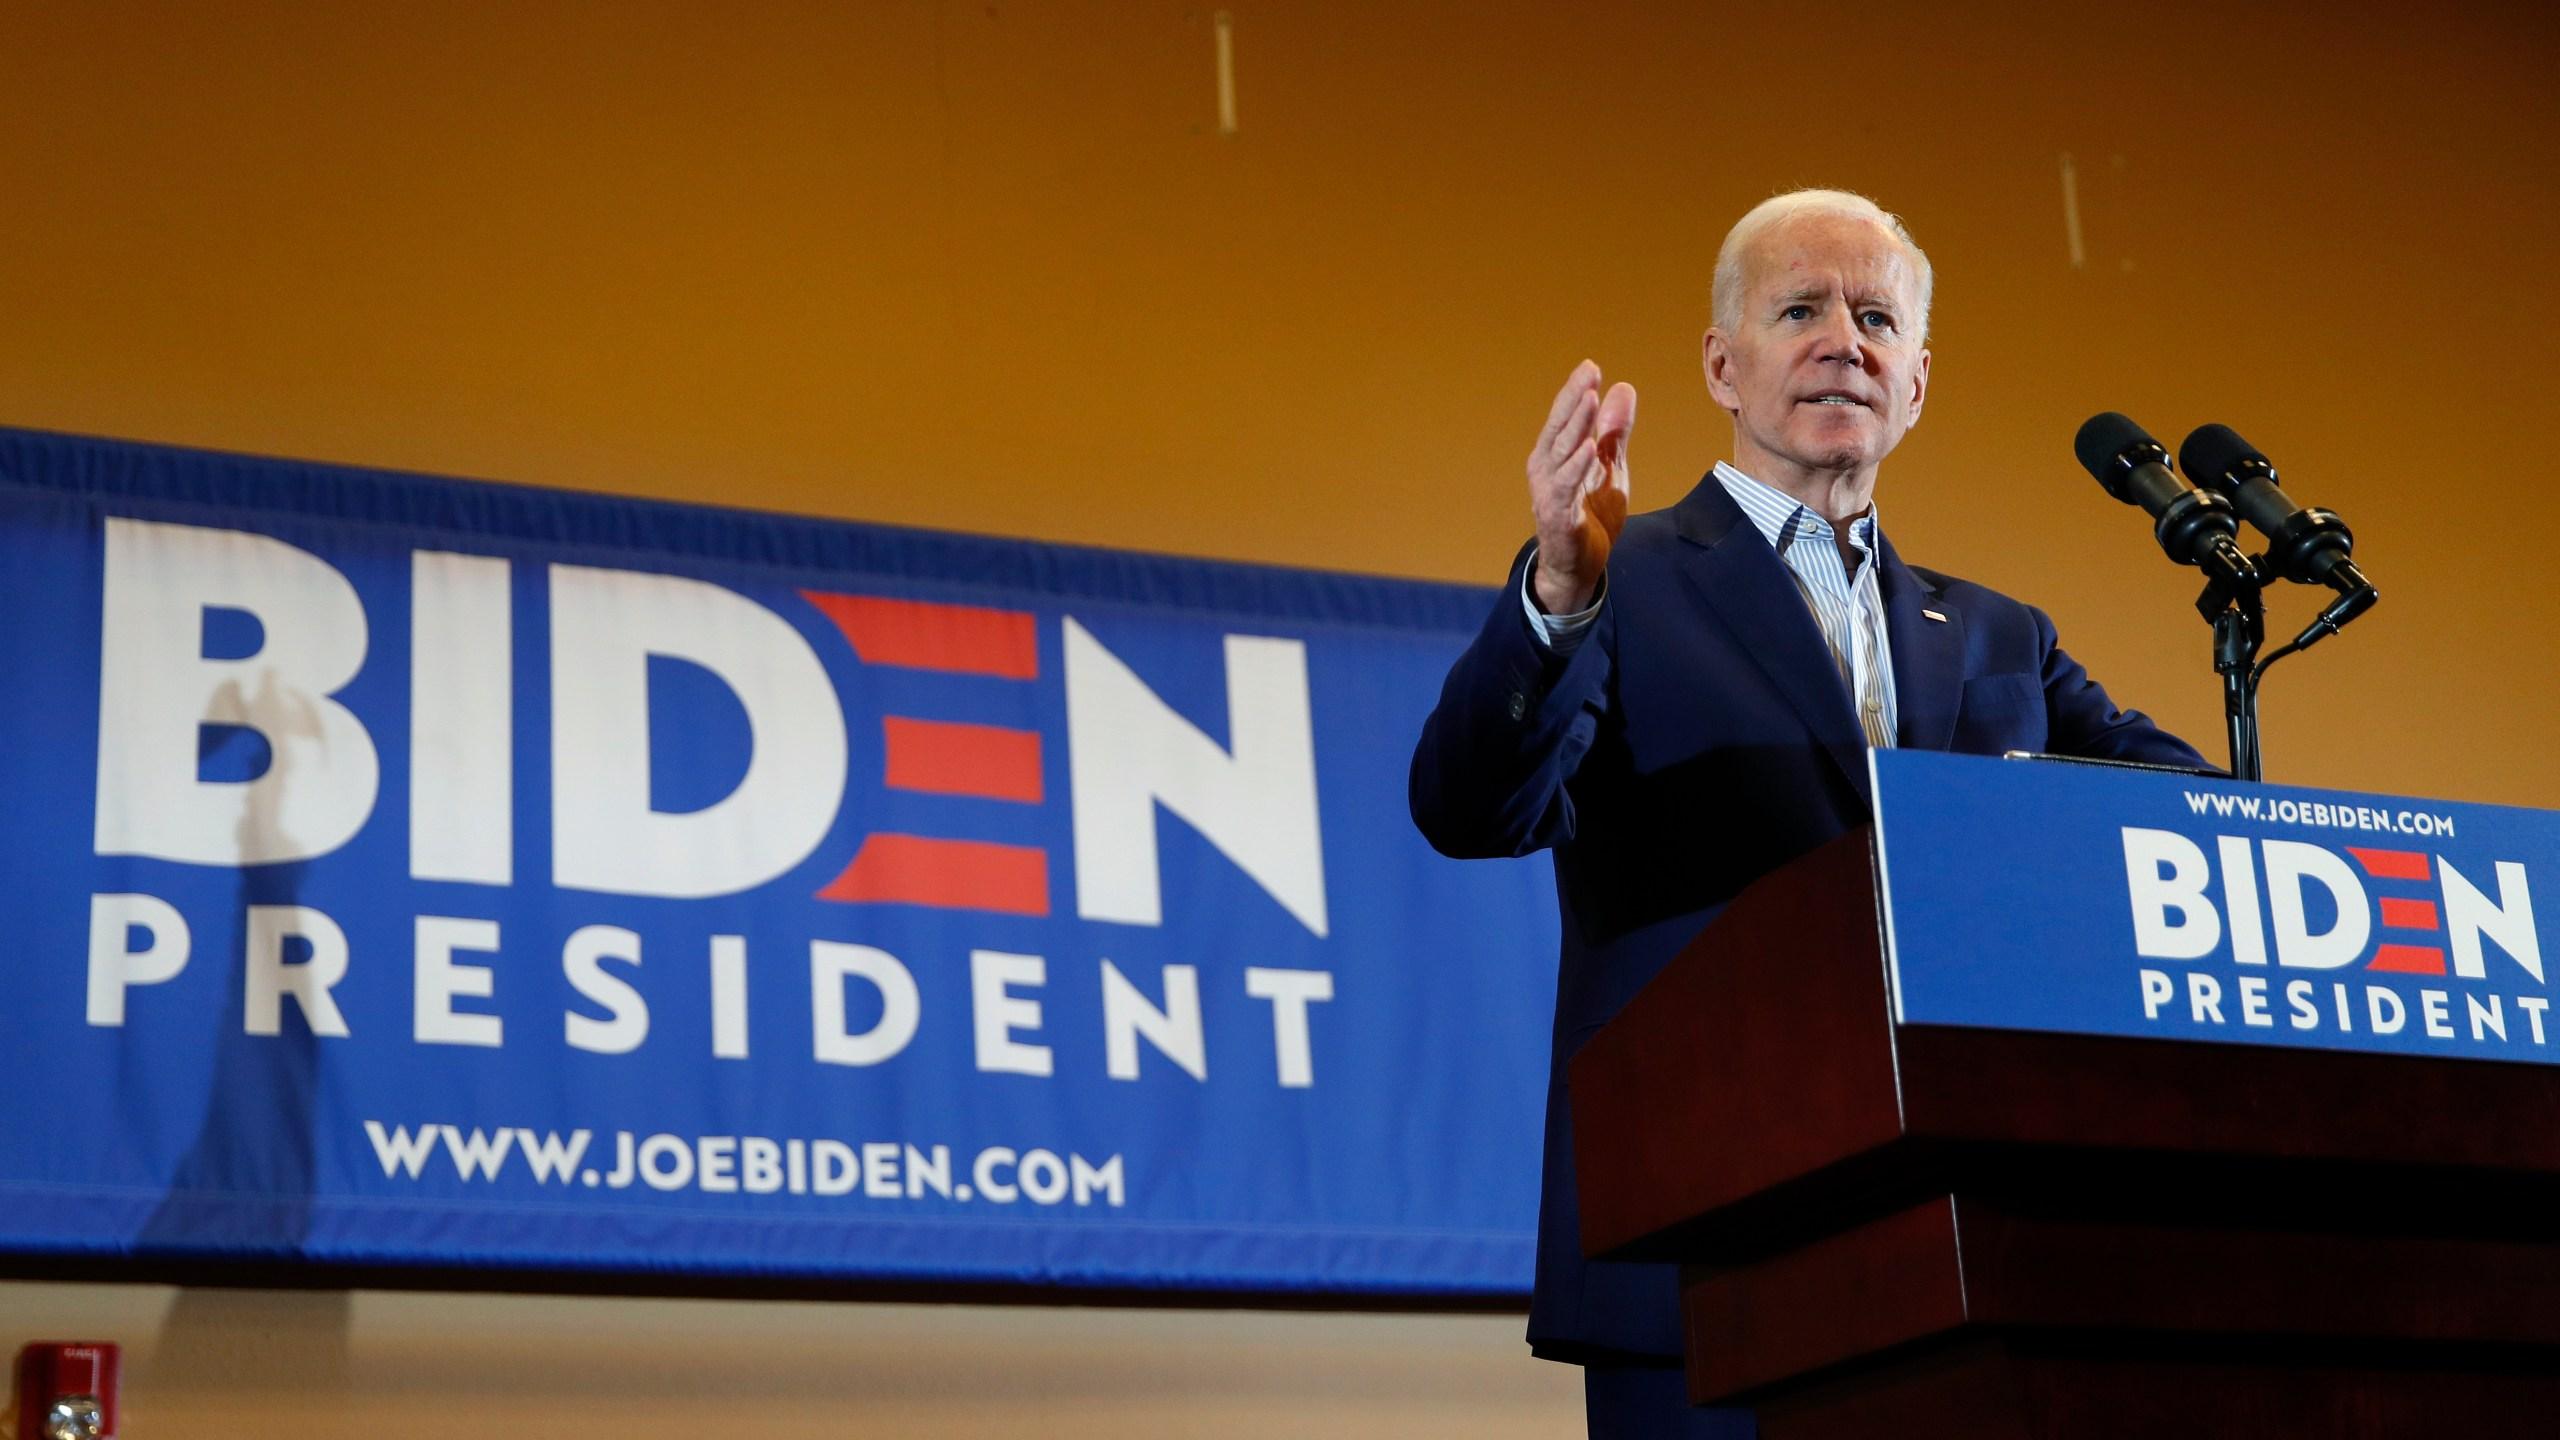 Election_2020_Joe_Biden_22205-159532.jpg18517978